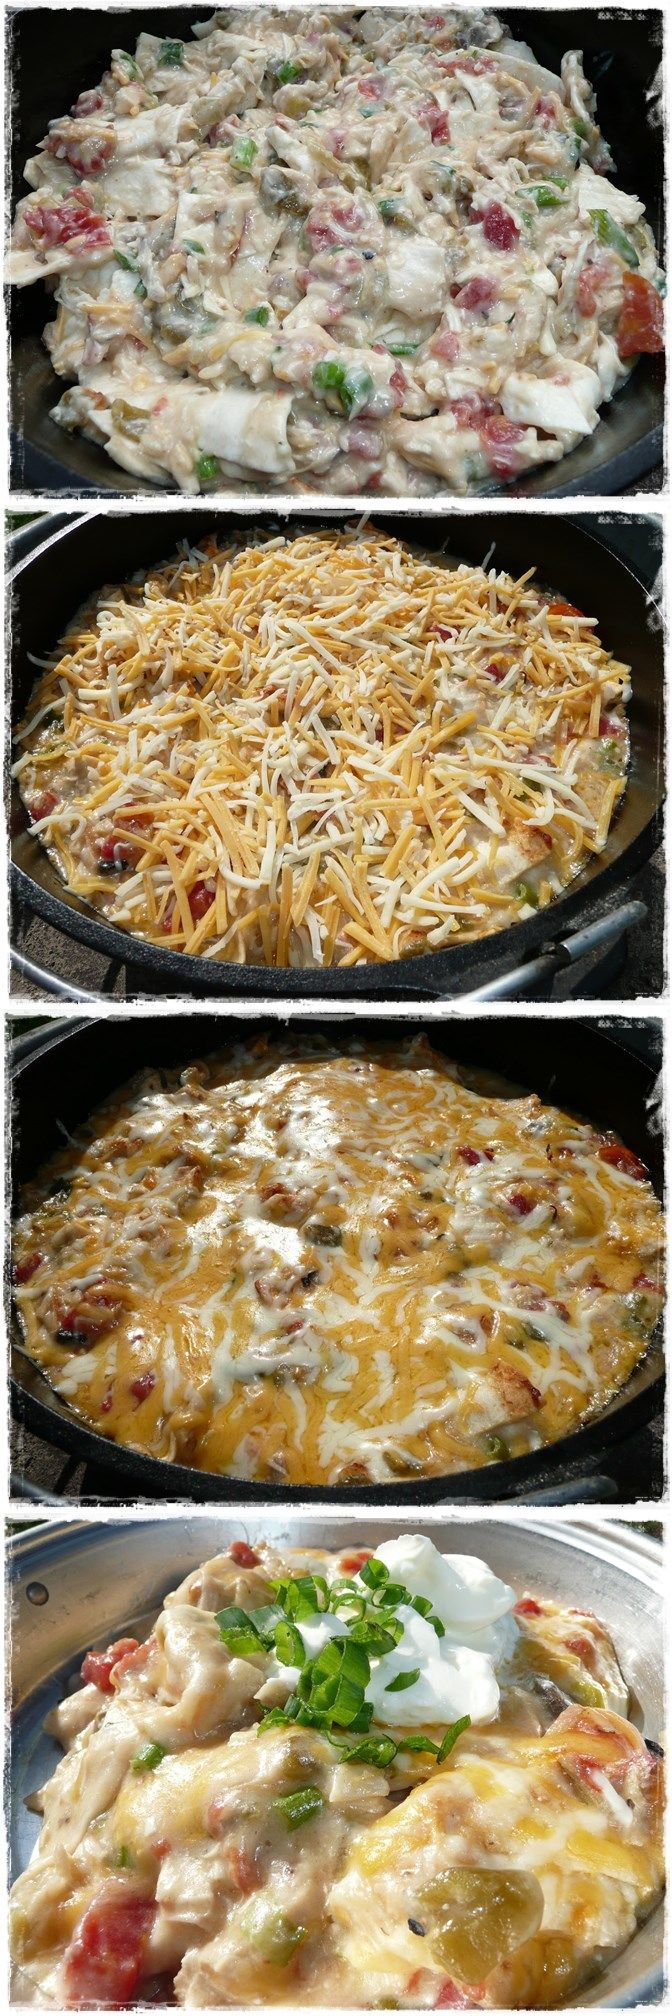 Dude Ranch Chicken - Cook Blog